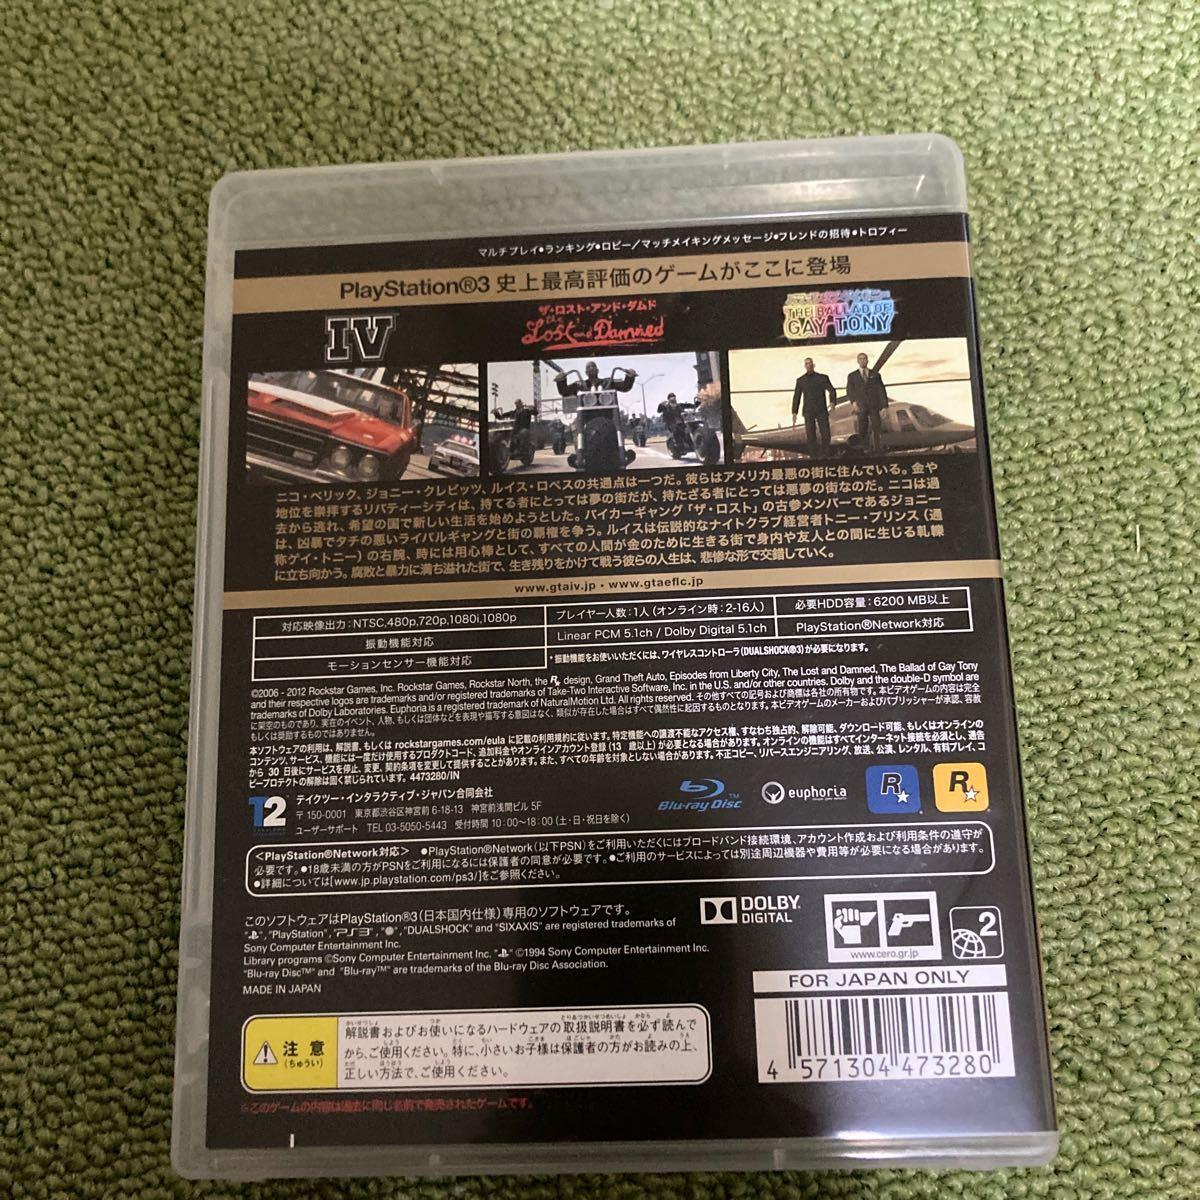 【PS3】 グランド・セフト・オートIV コンプリートエディション [通常版]